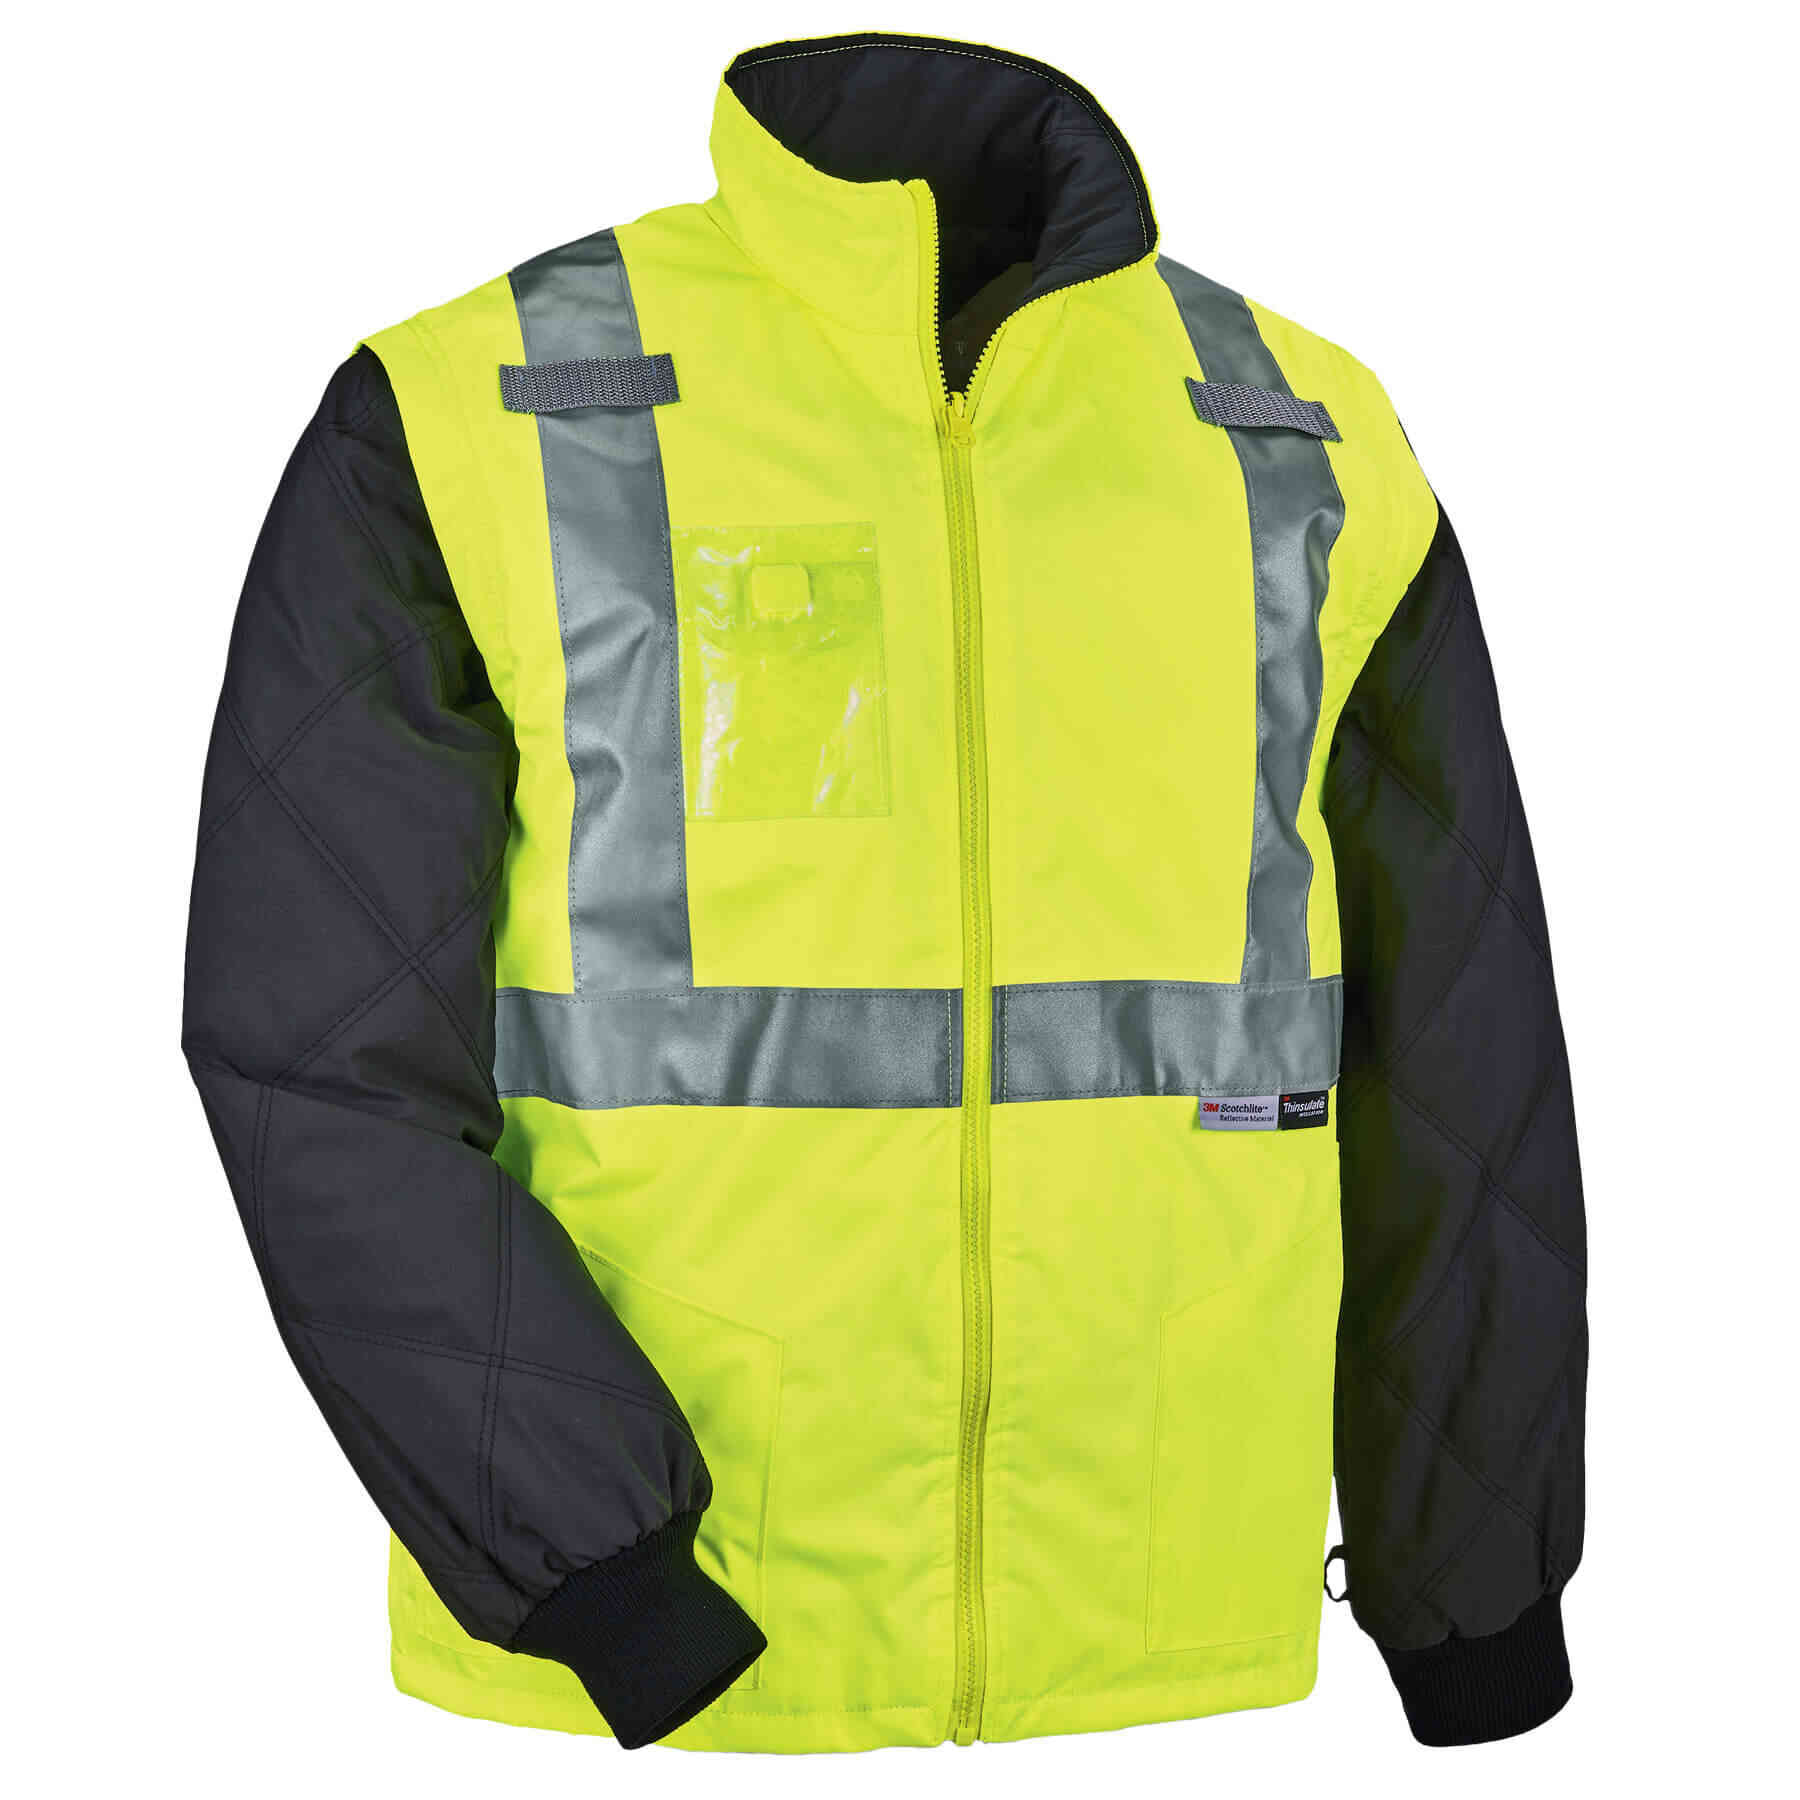 Convertible Thermal Hi Vis Safety Jacket Type R Class 2 Ergodyne